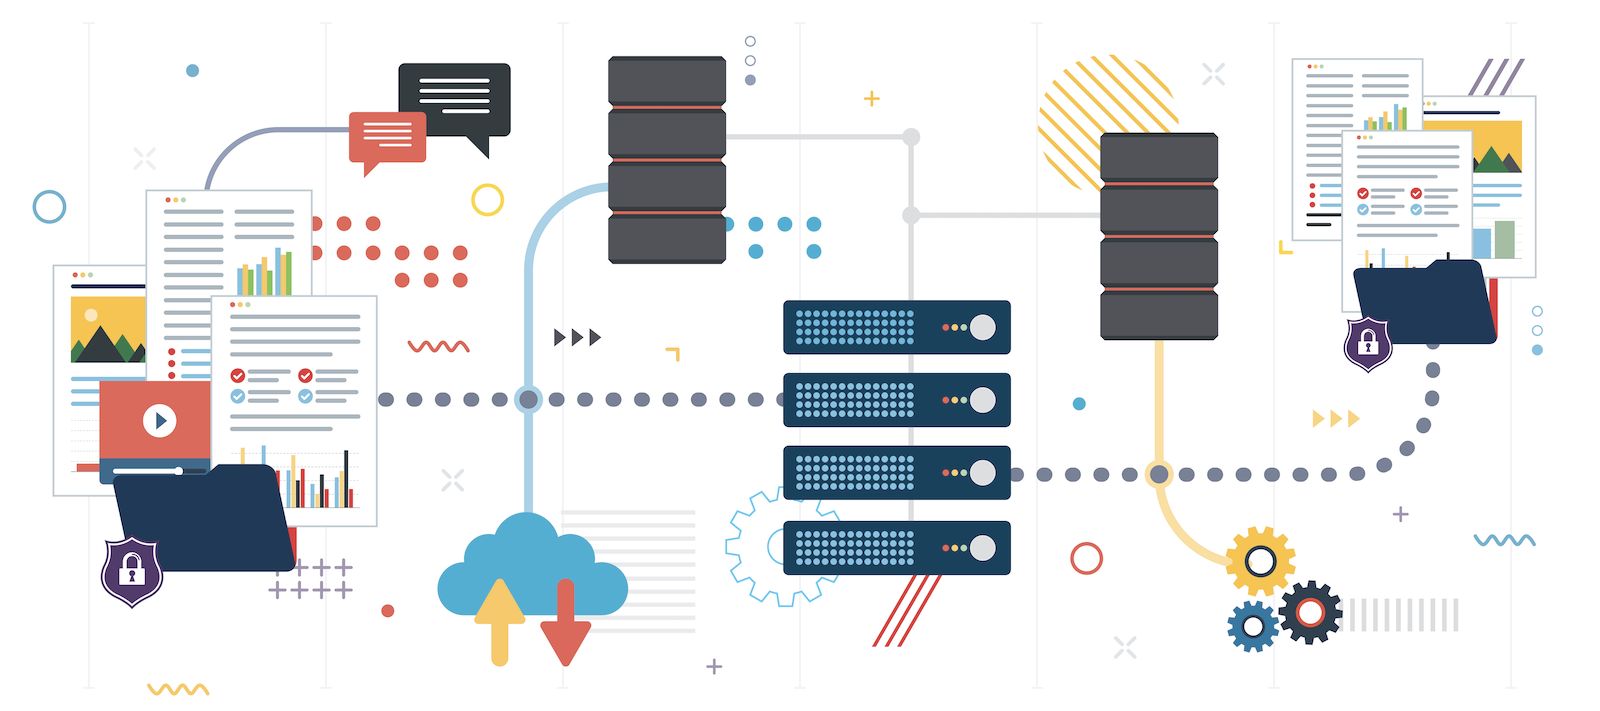 enterprise data warehouse: illustration of file sharing